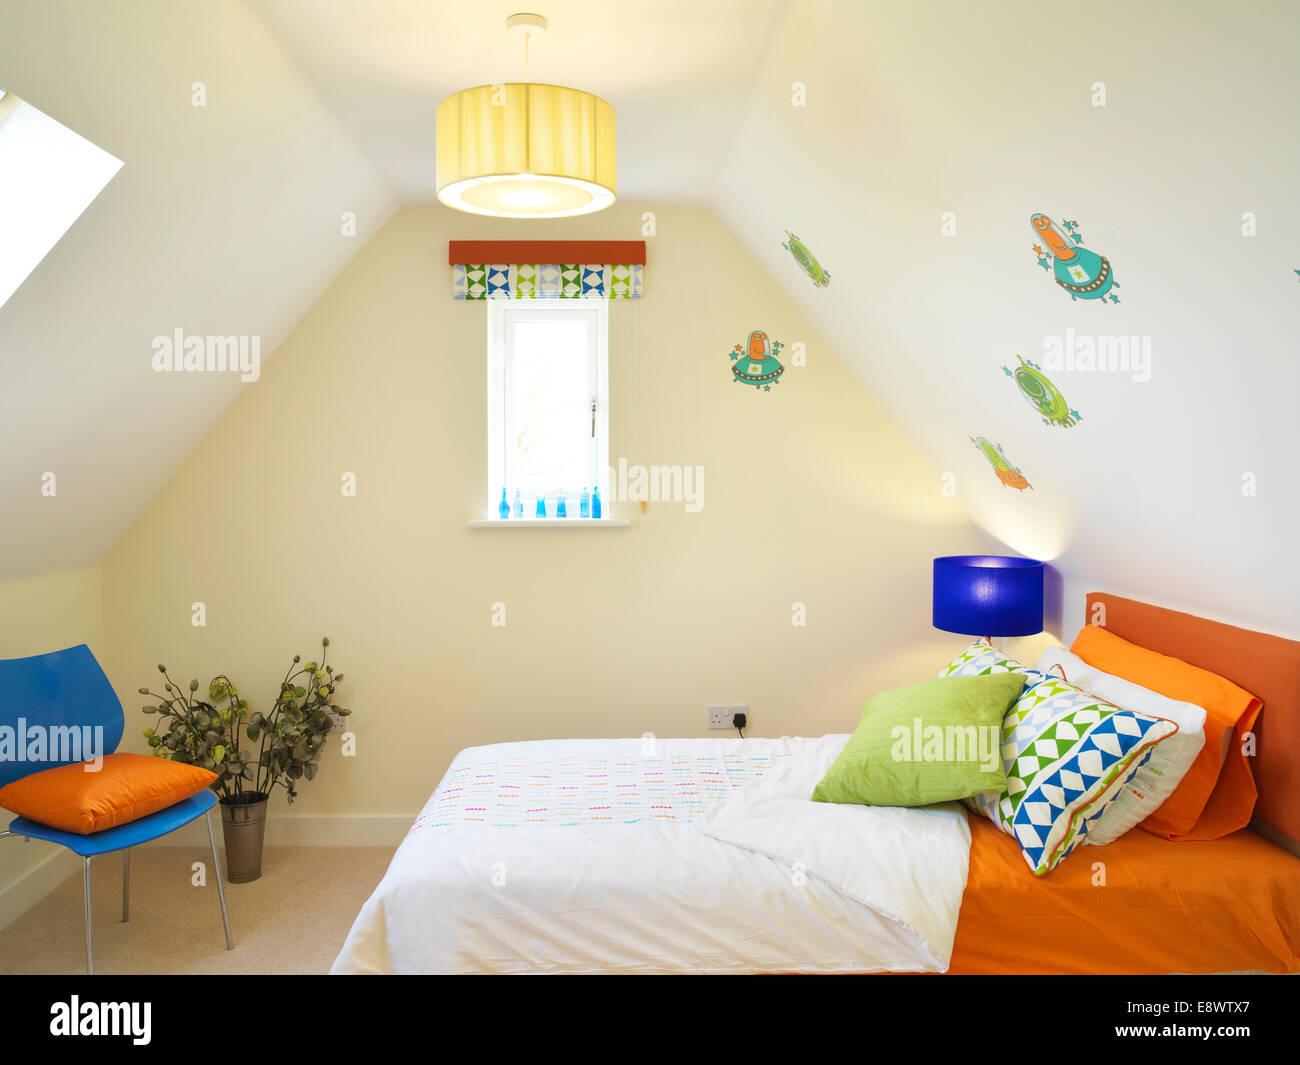 Interiors Bedroom Attic Bed Stockfotos & Interiors Bedroom Attic Bed ...